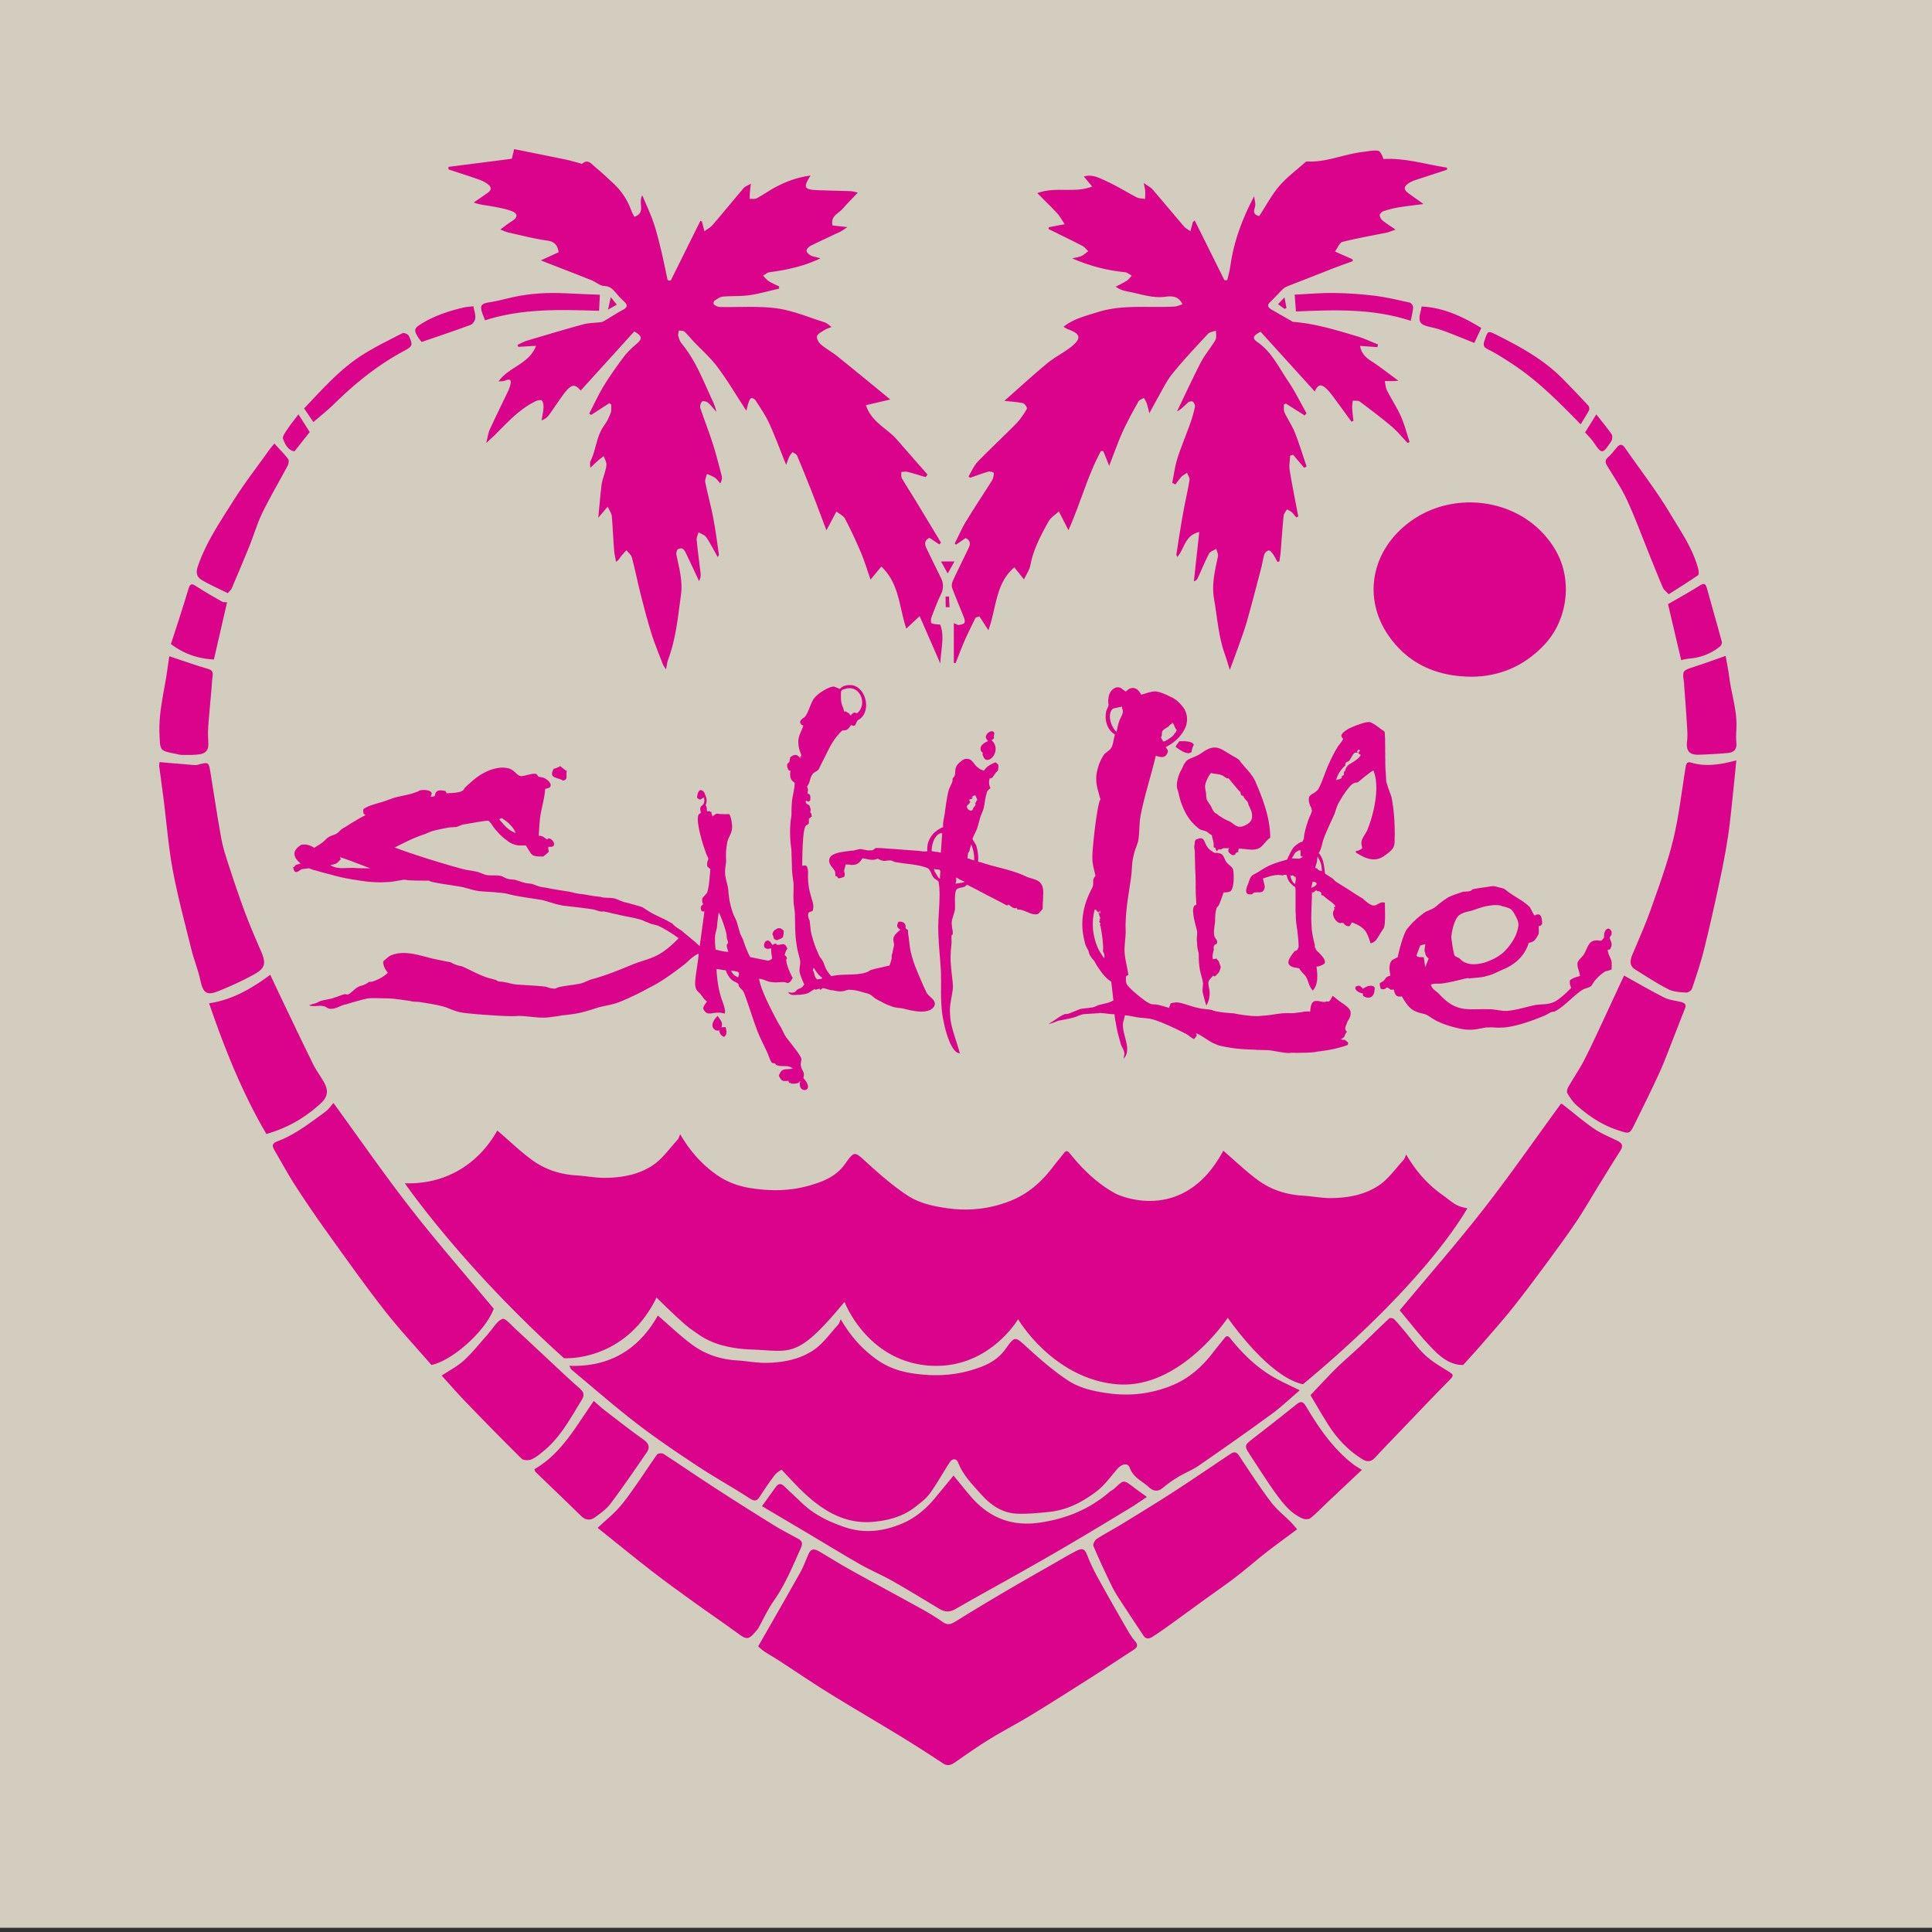 Salt Life Palmtree Love Decal Salt Life Decals Salt Life Cricut Crafts [ 2500 x 2500 Pixel ]